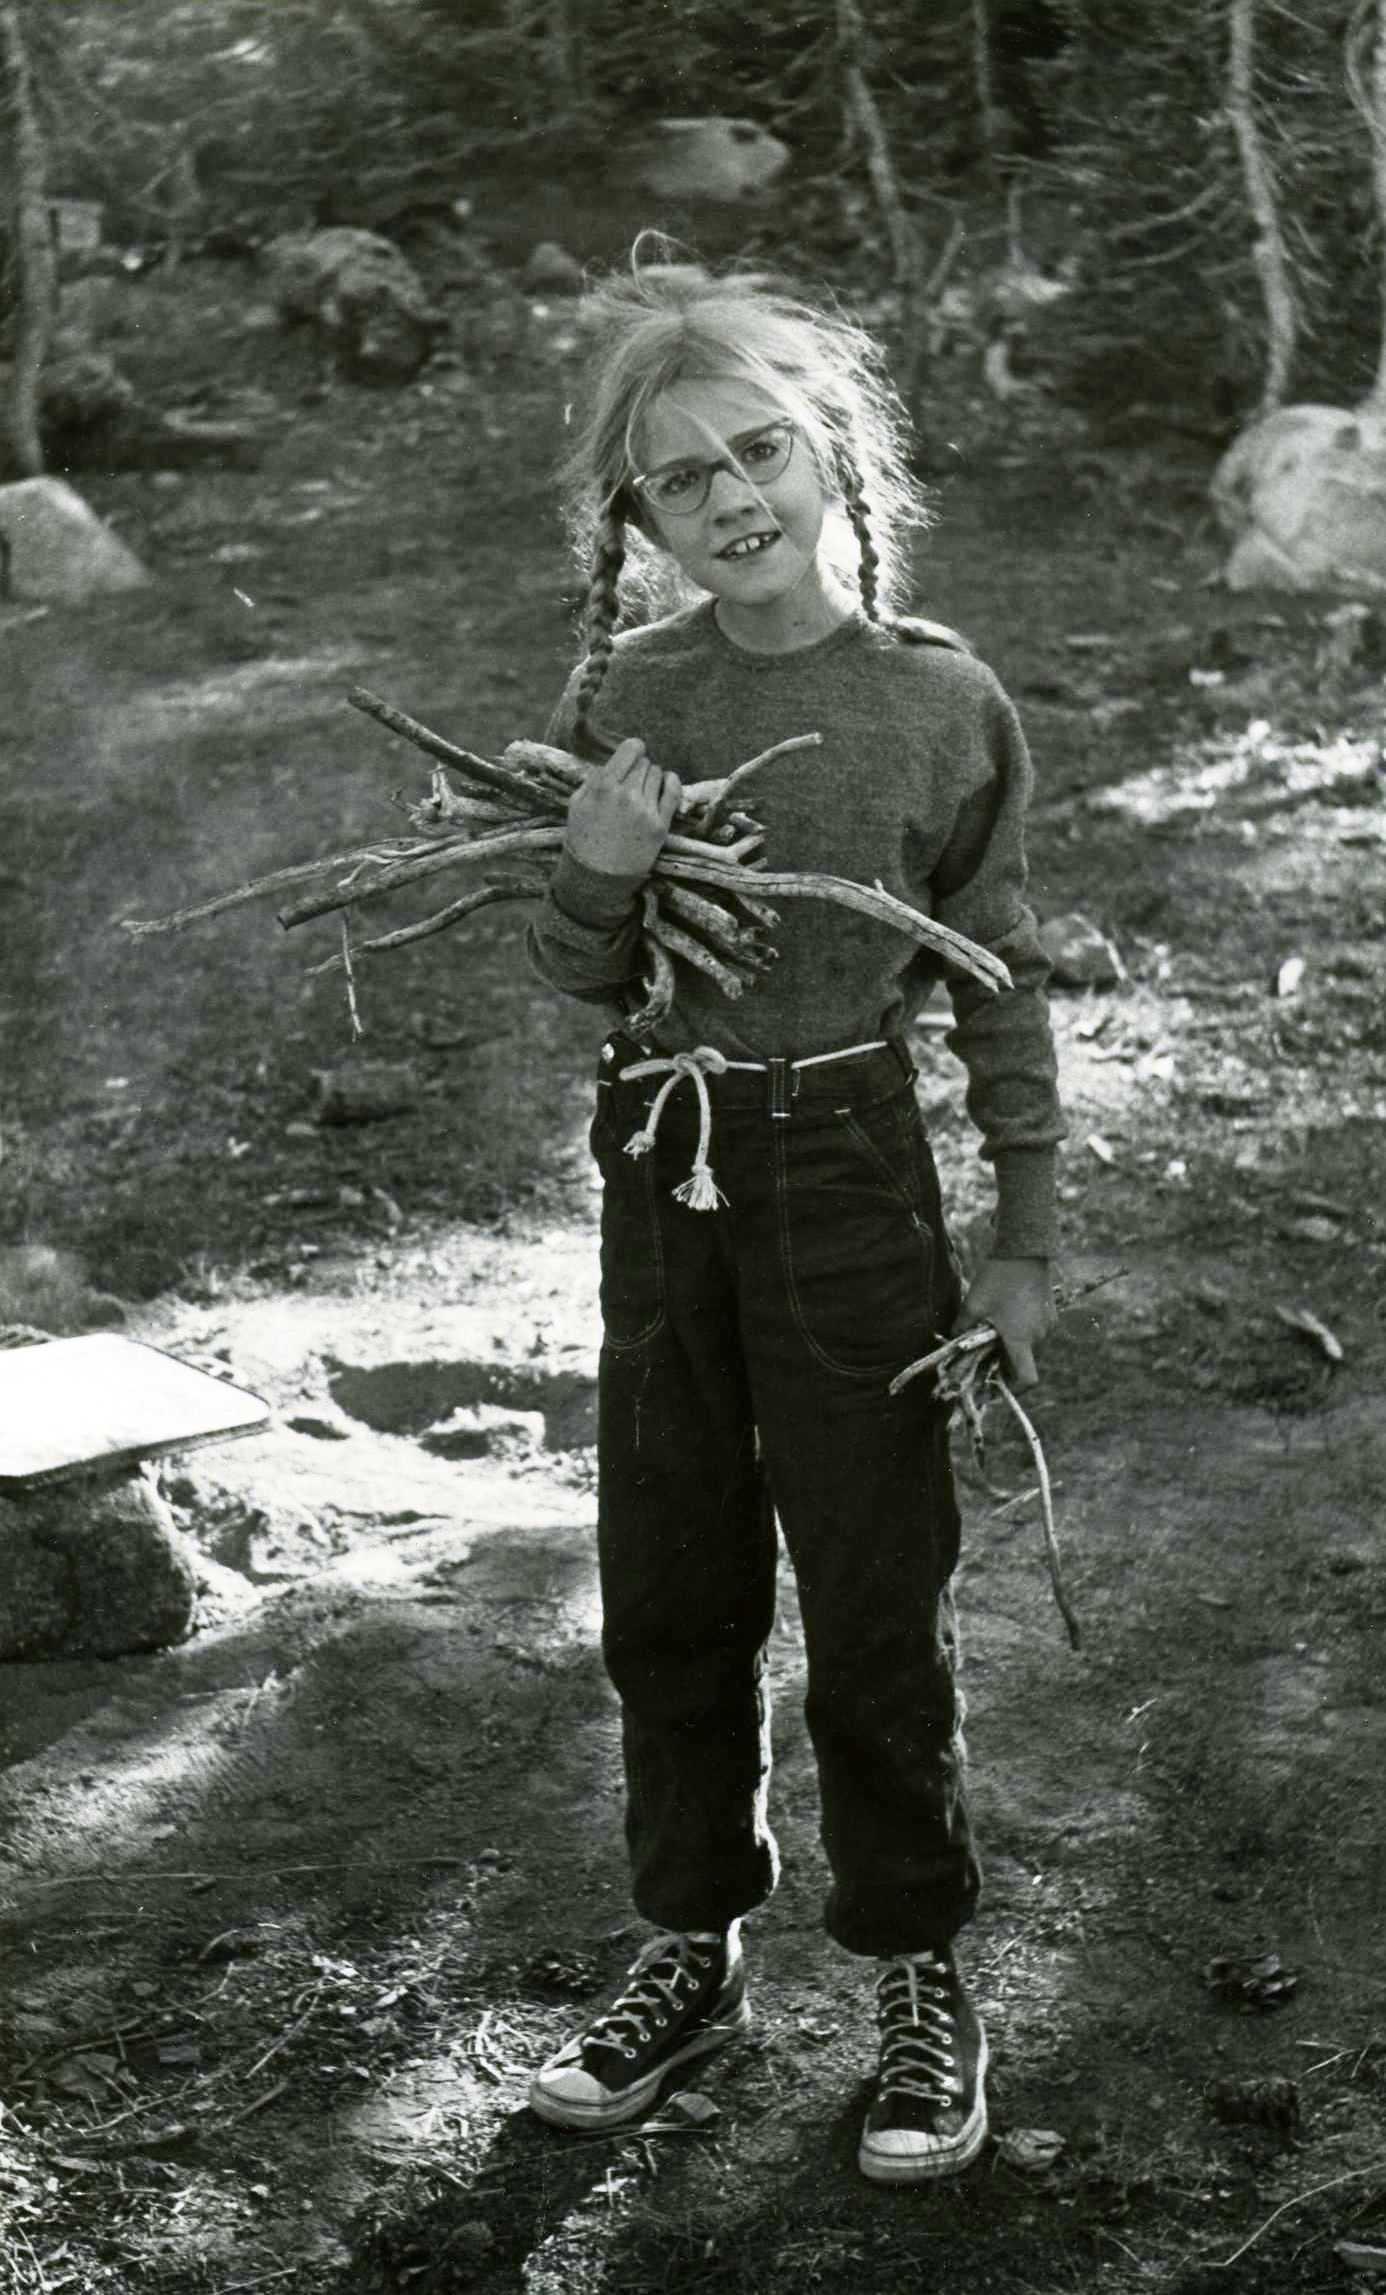 collecting sticks.jpg